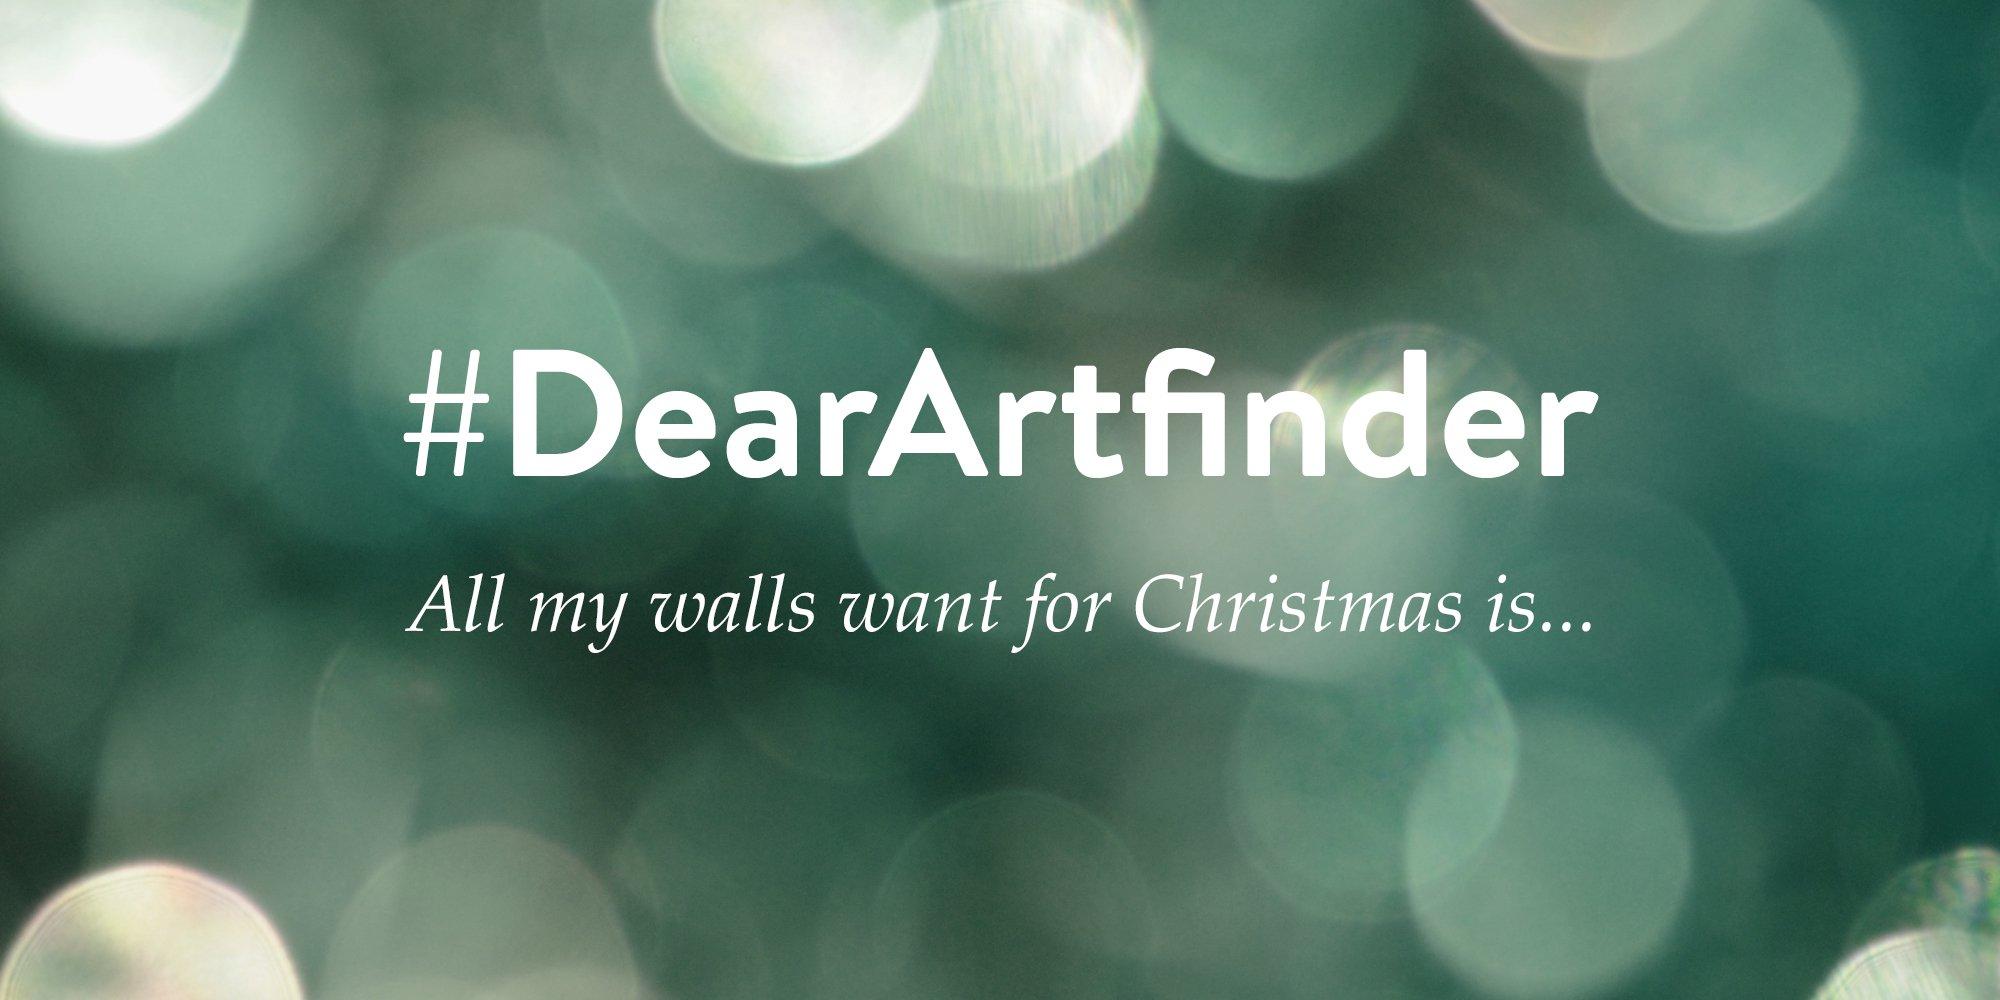 #DearArtfinder - Win an Artwork a Day!